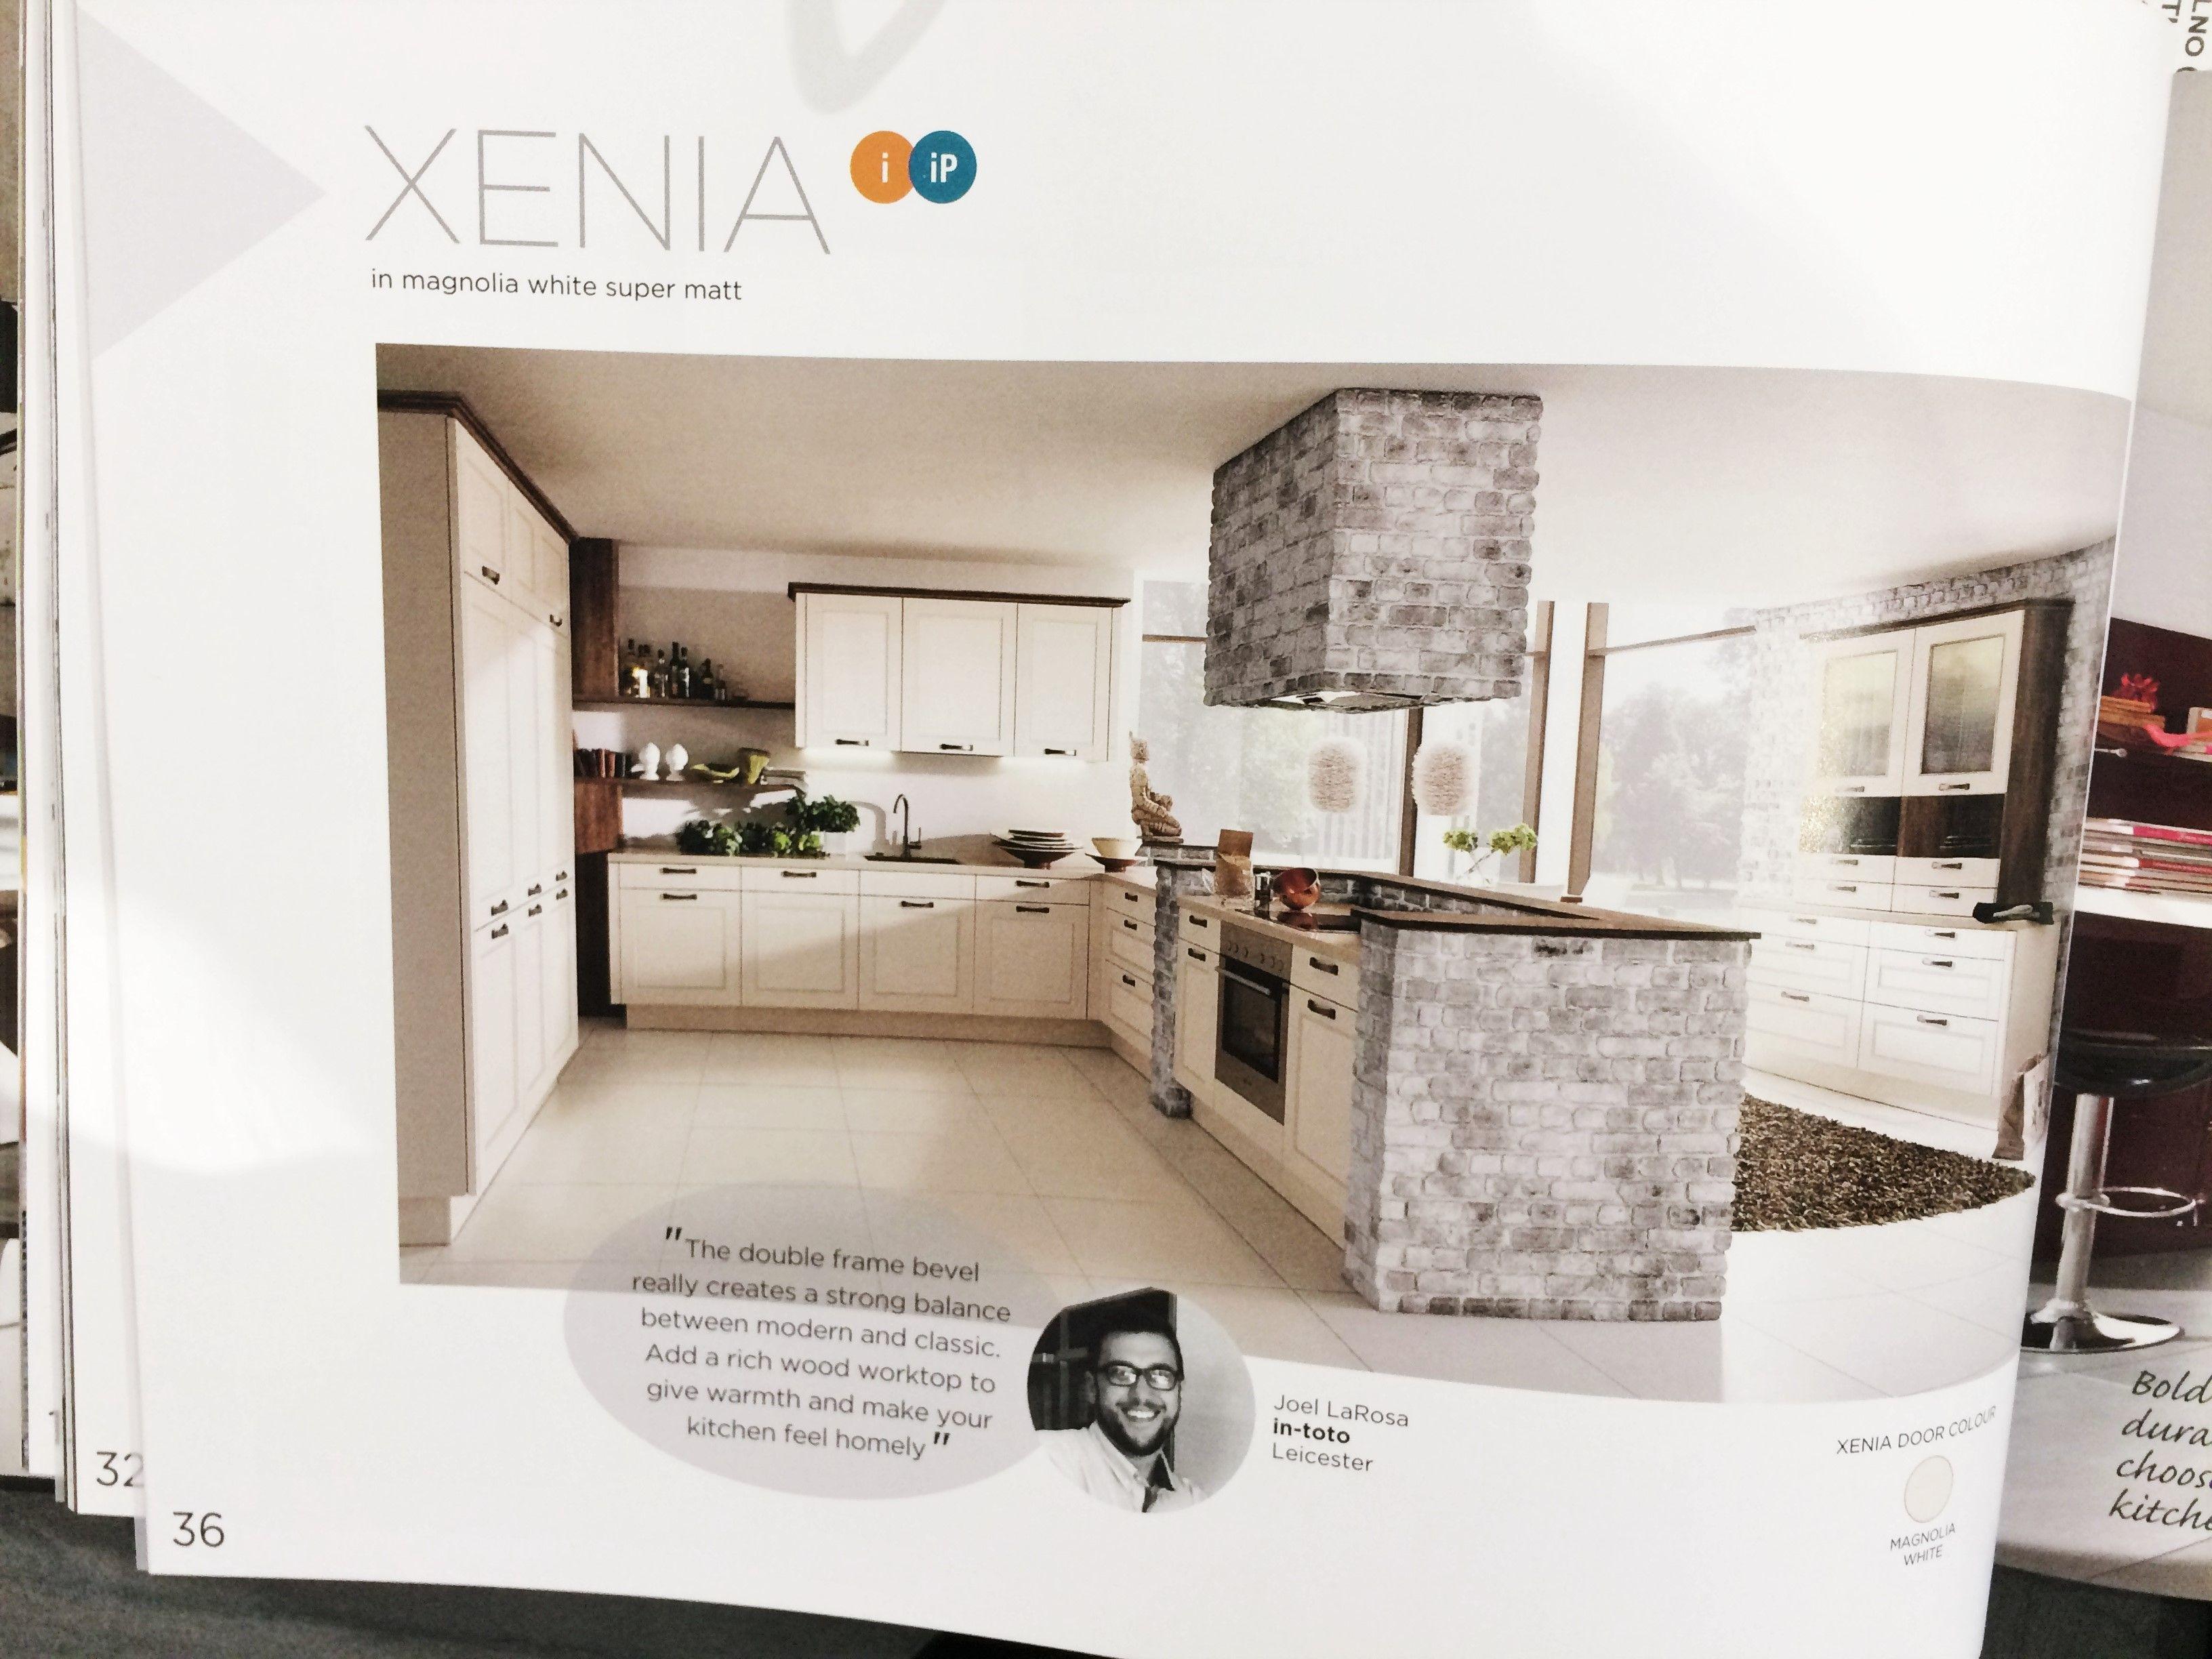 Chosen For You A Kitchen This Month Xenia In Magnolia White Super Matt